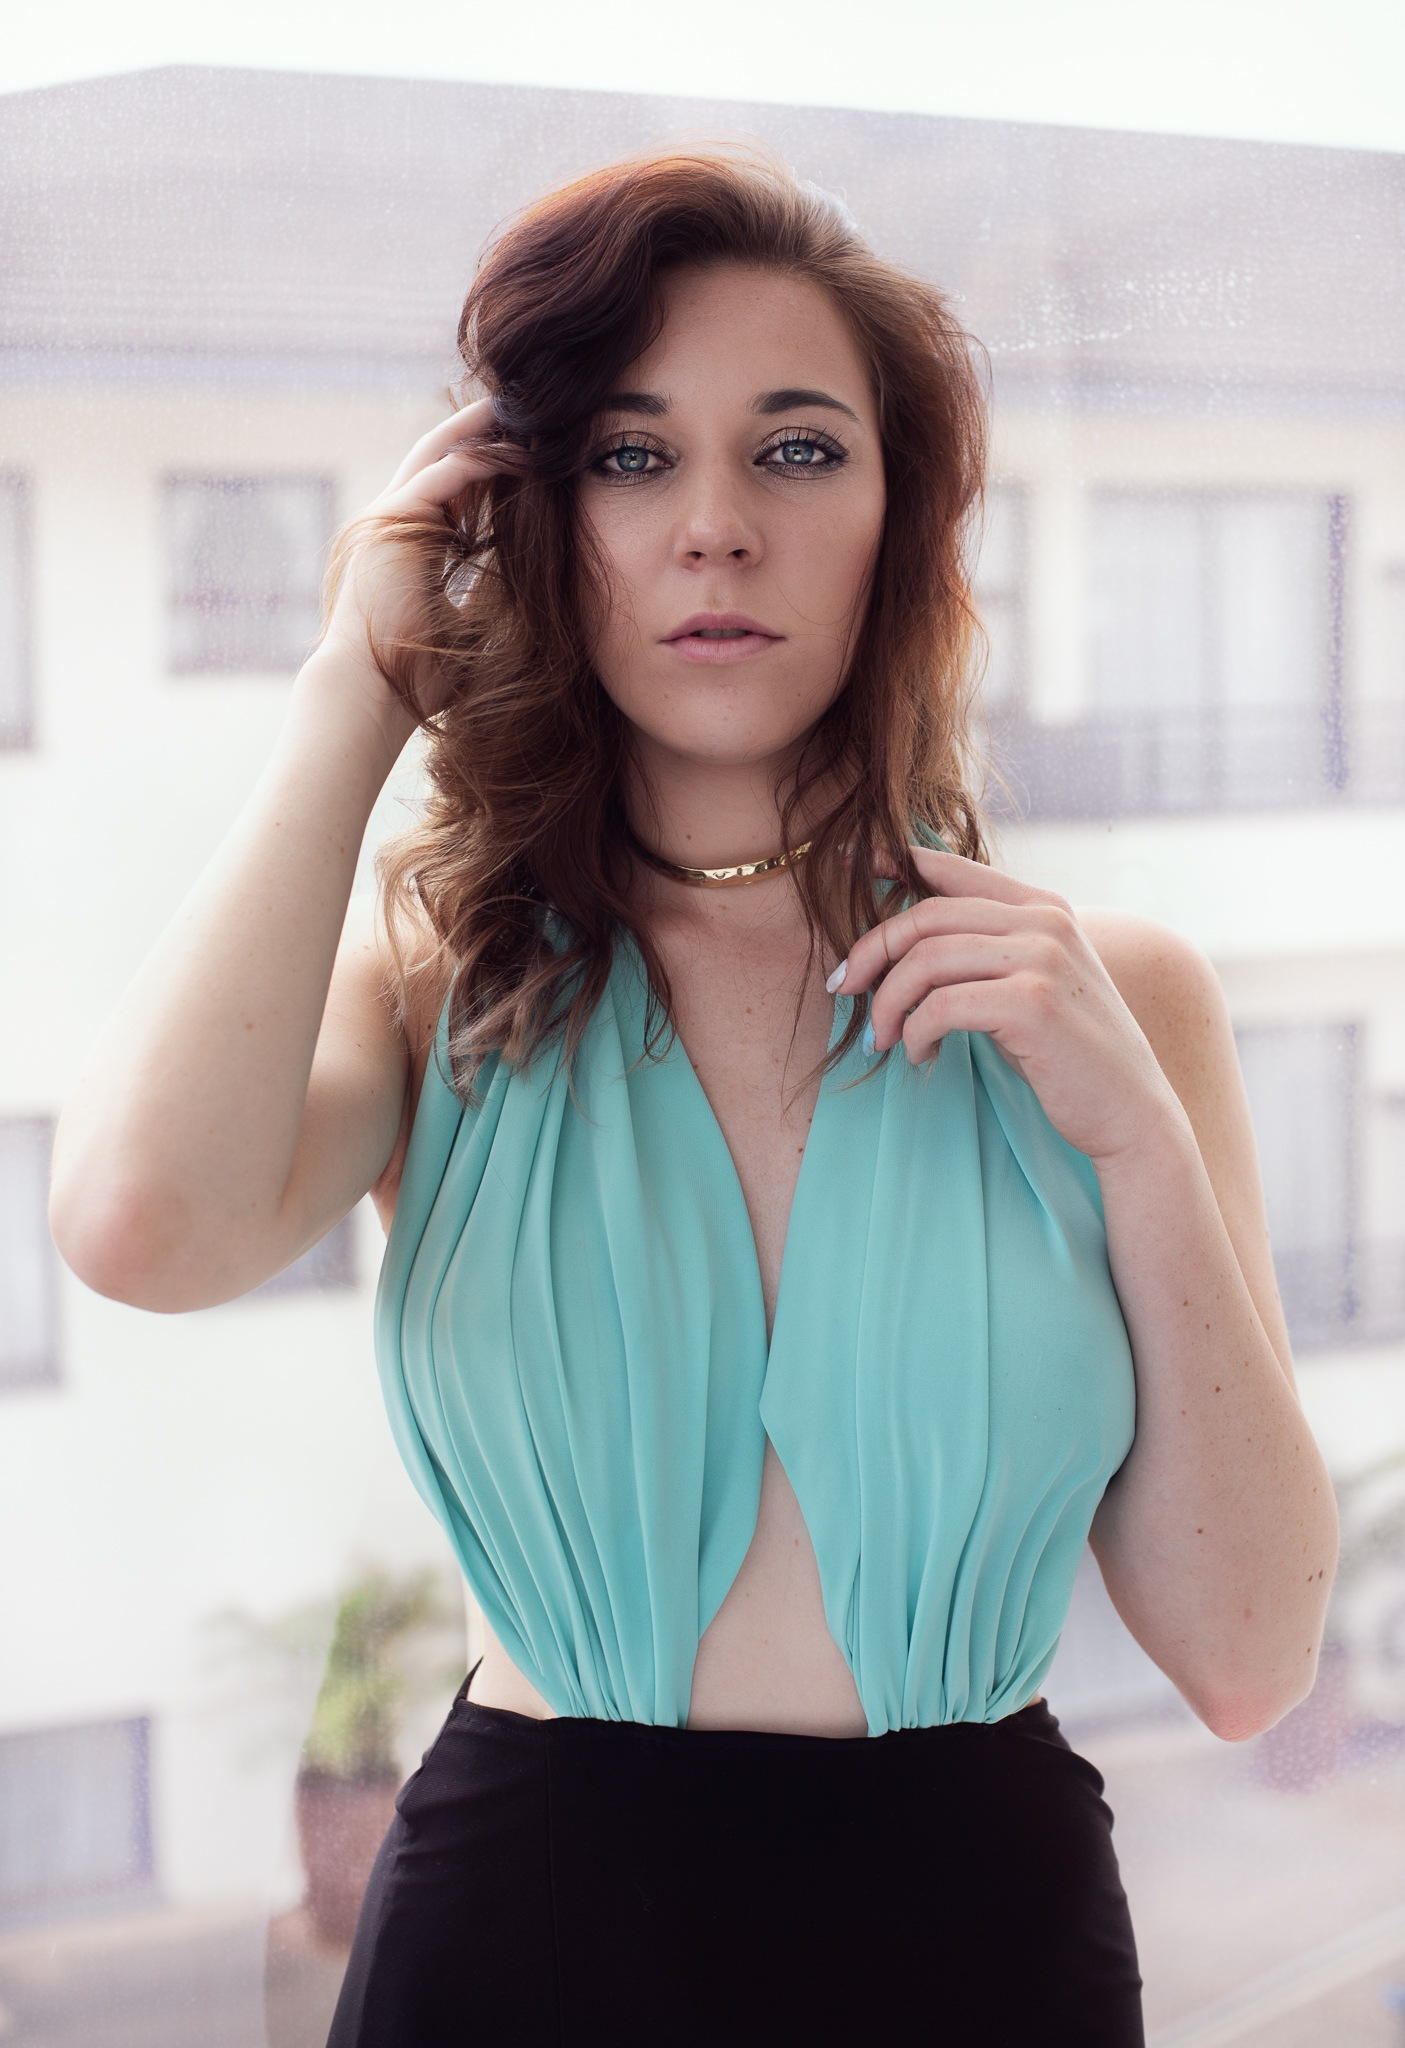 Photo in Portrait #portrait #fashion #indoors #dress #brunette #woman #model #window #backlit #natural light